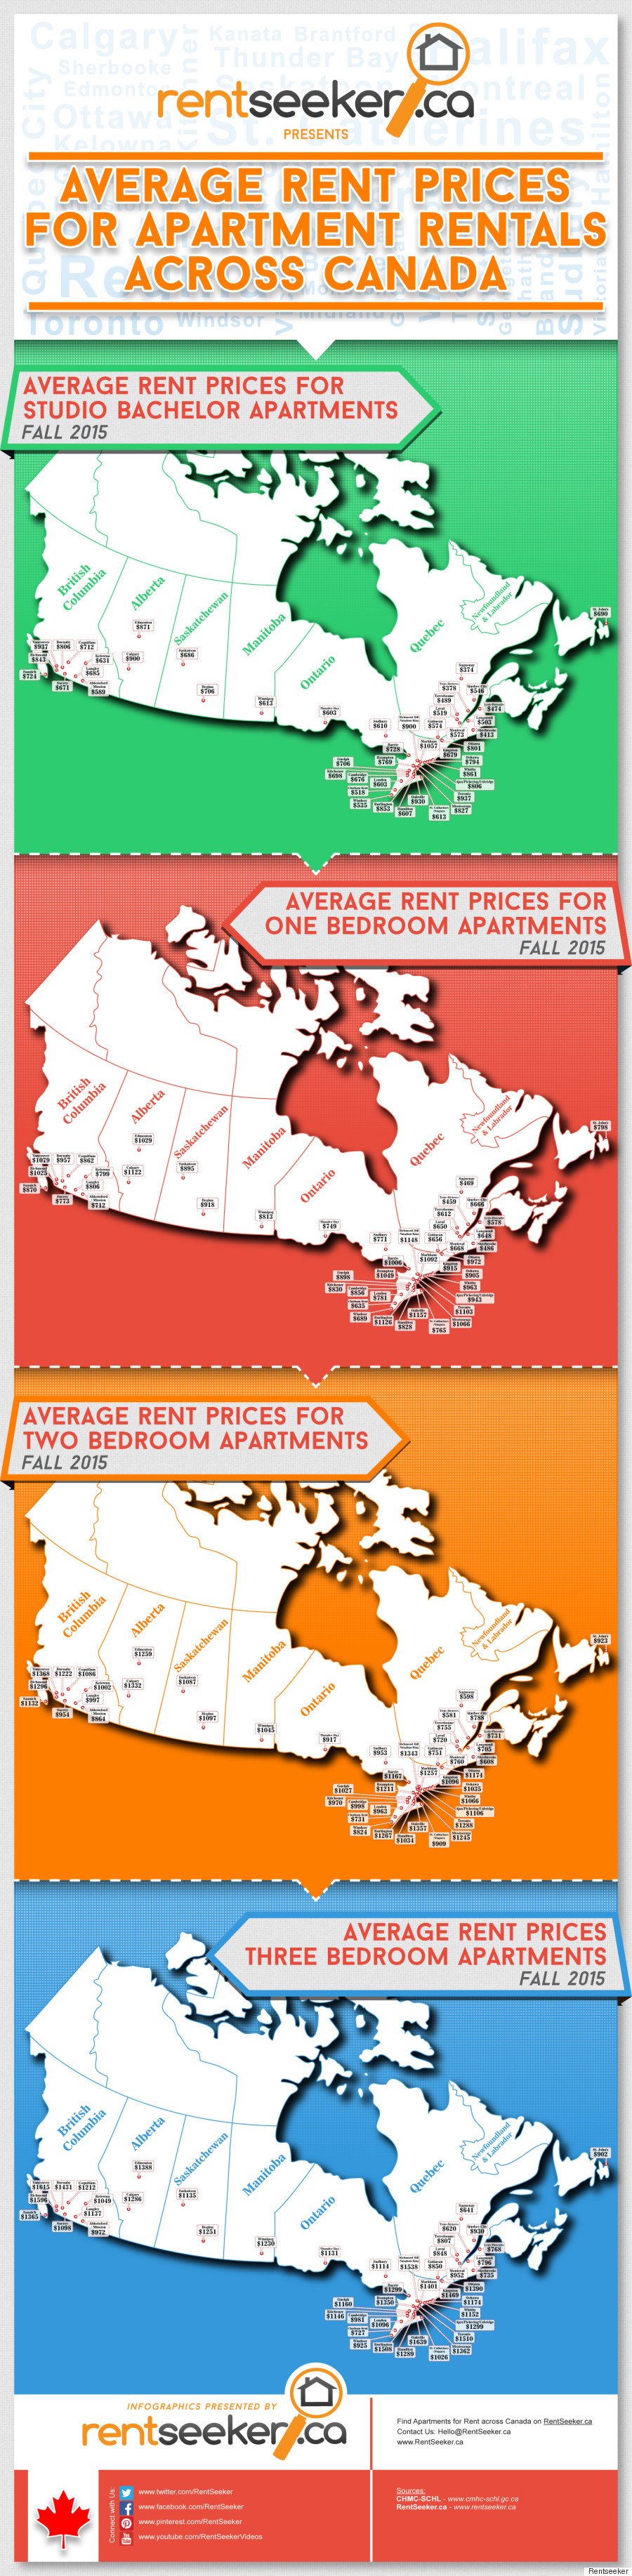 rentseeker rents across canada